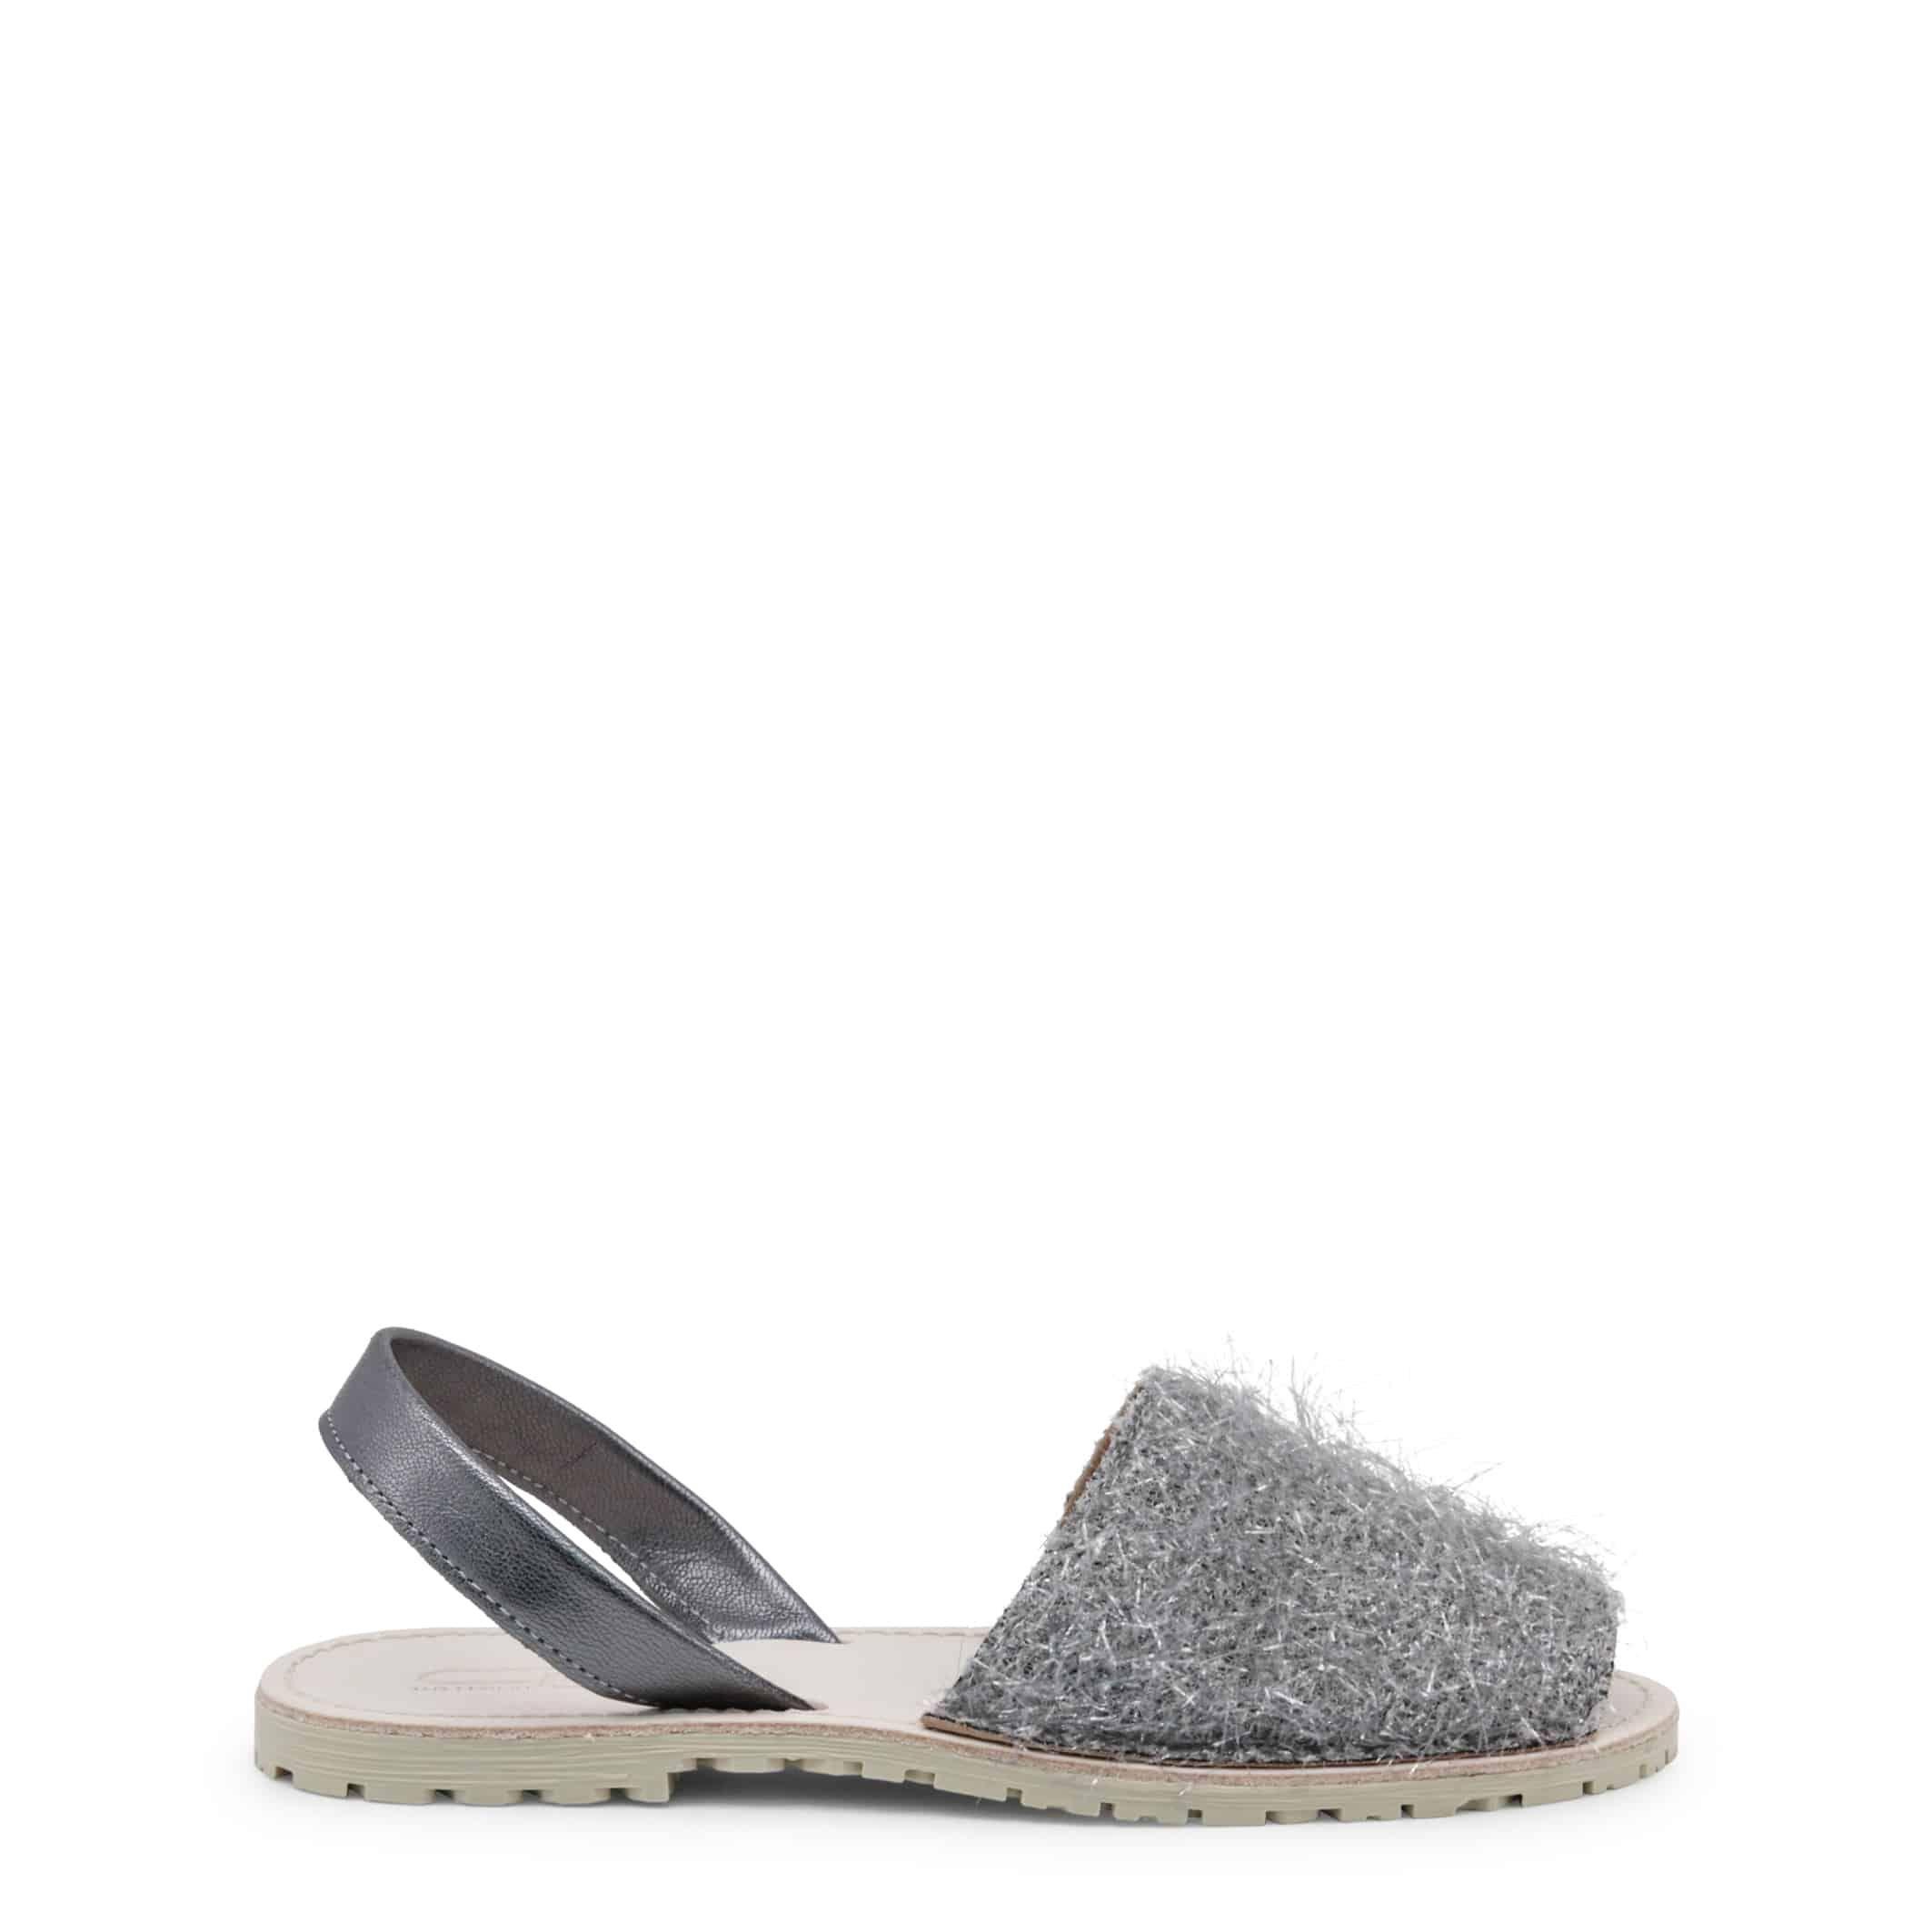 Chaussures Ana Lublin – GISELA